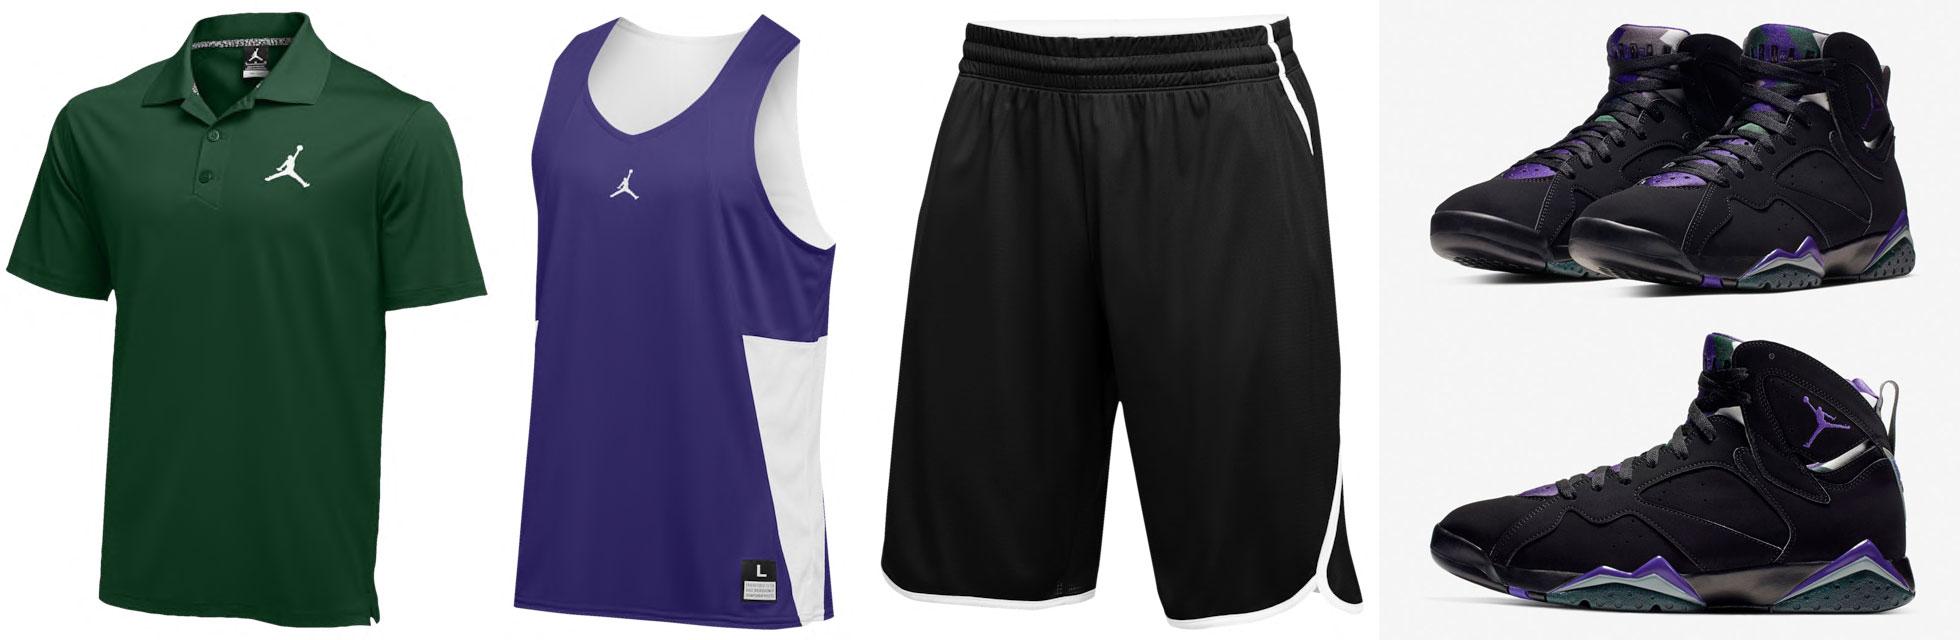 air-jordan-7-ray-allen-basketball-clothing